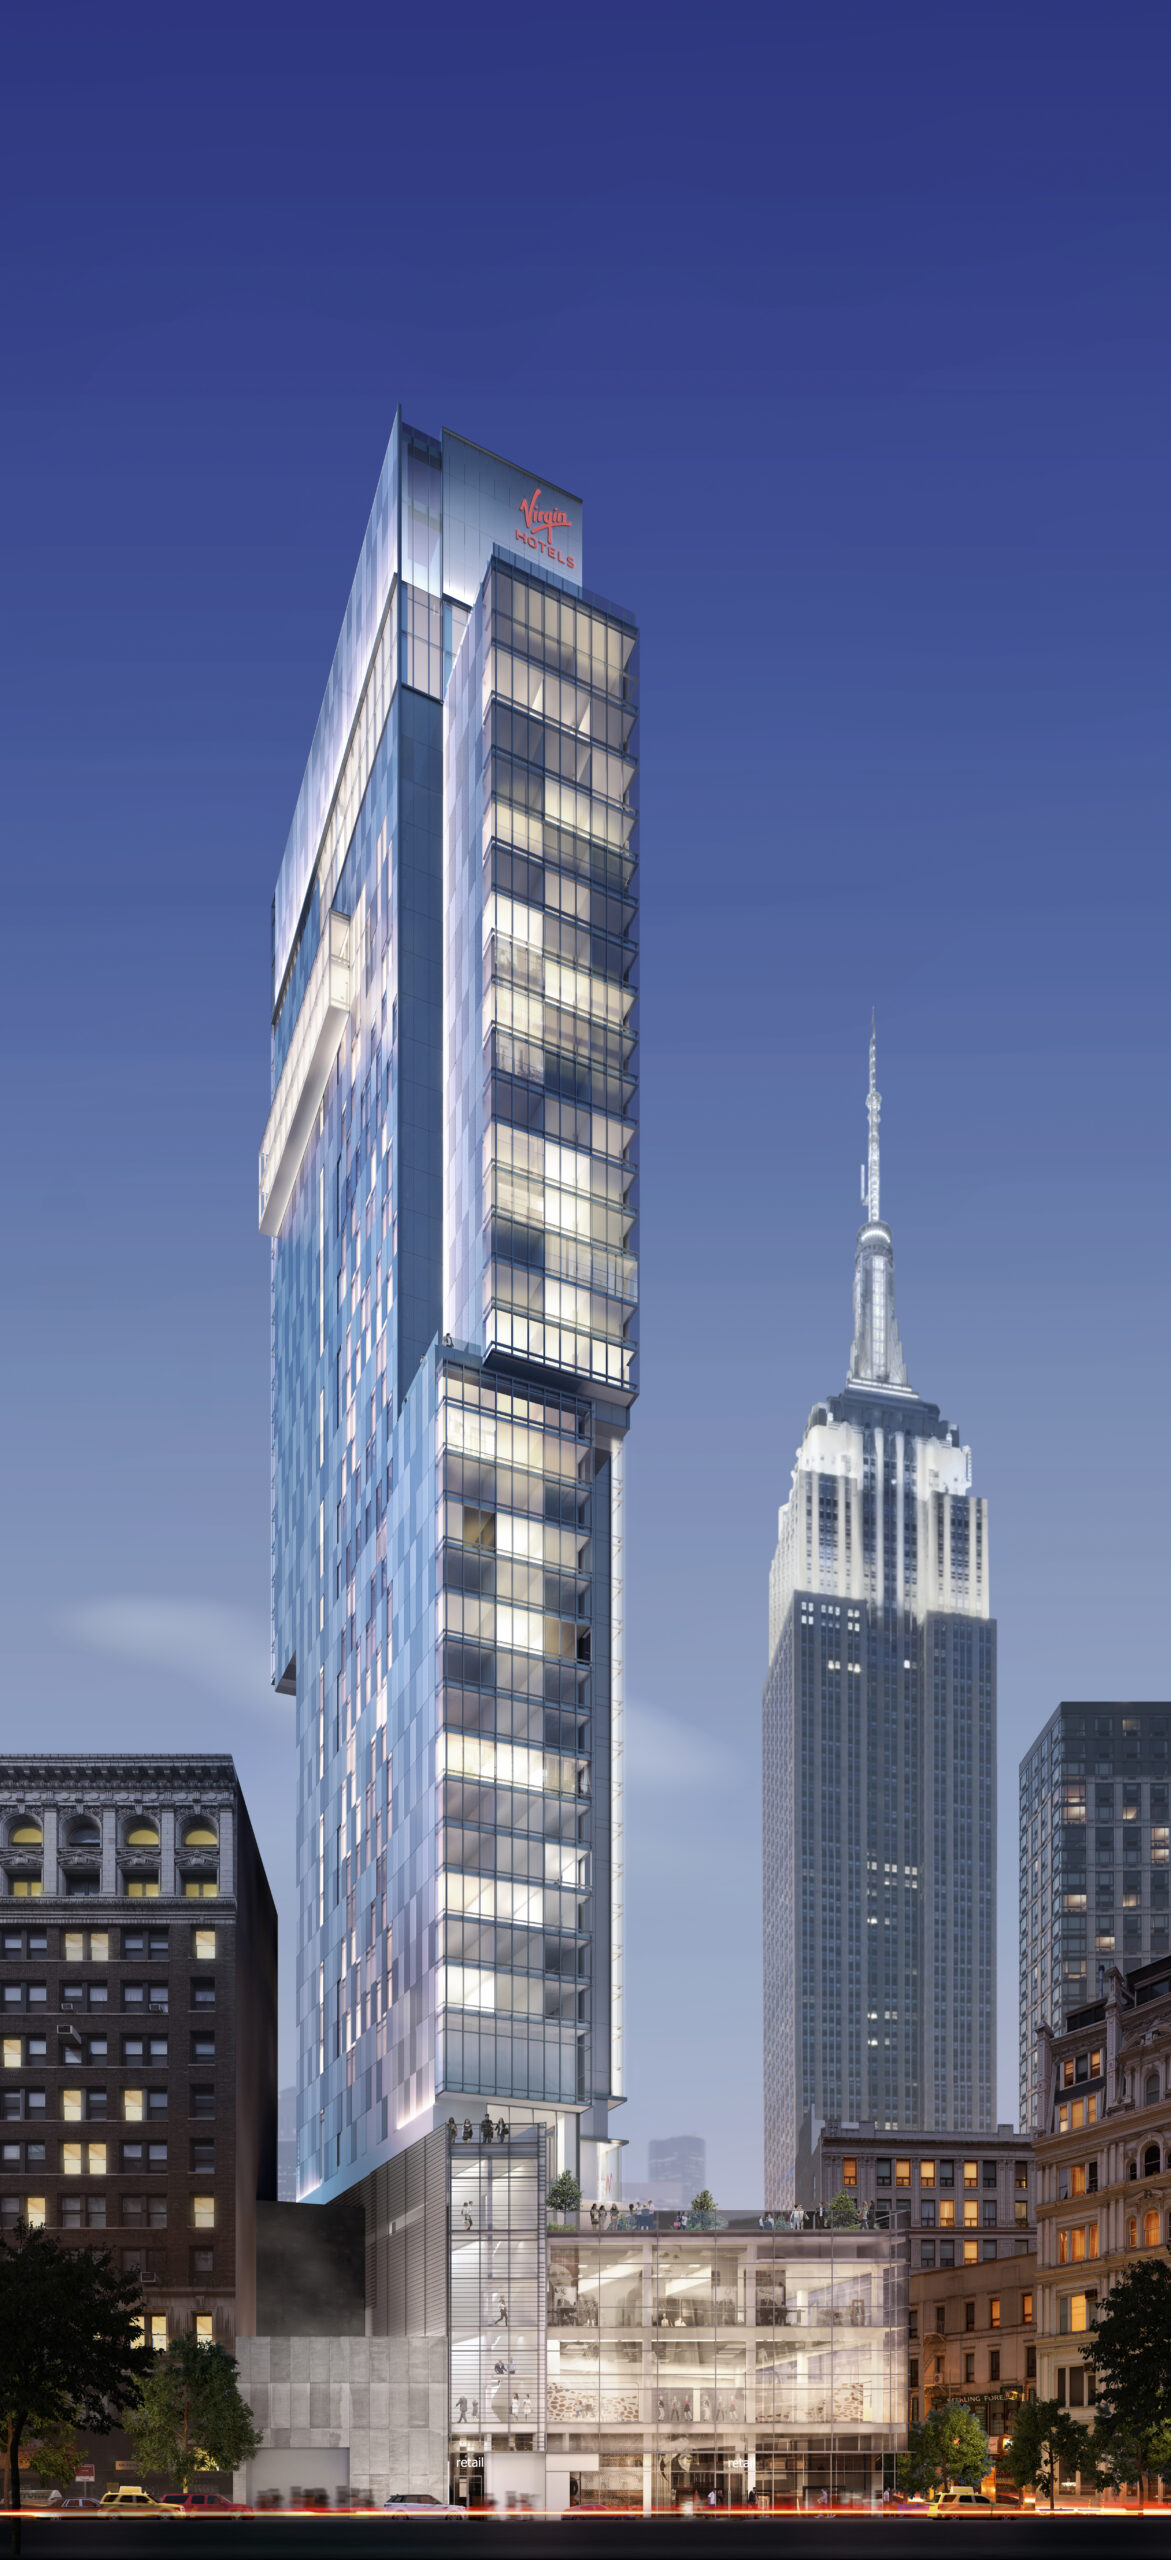 Virgin Hotels New York City